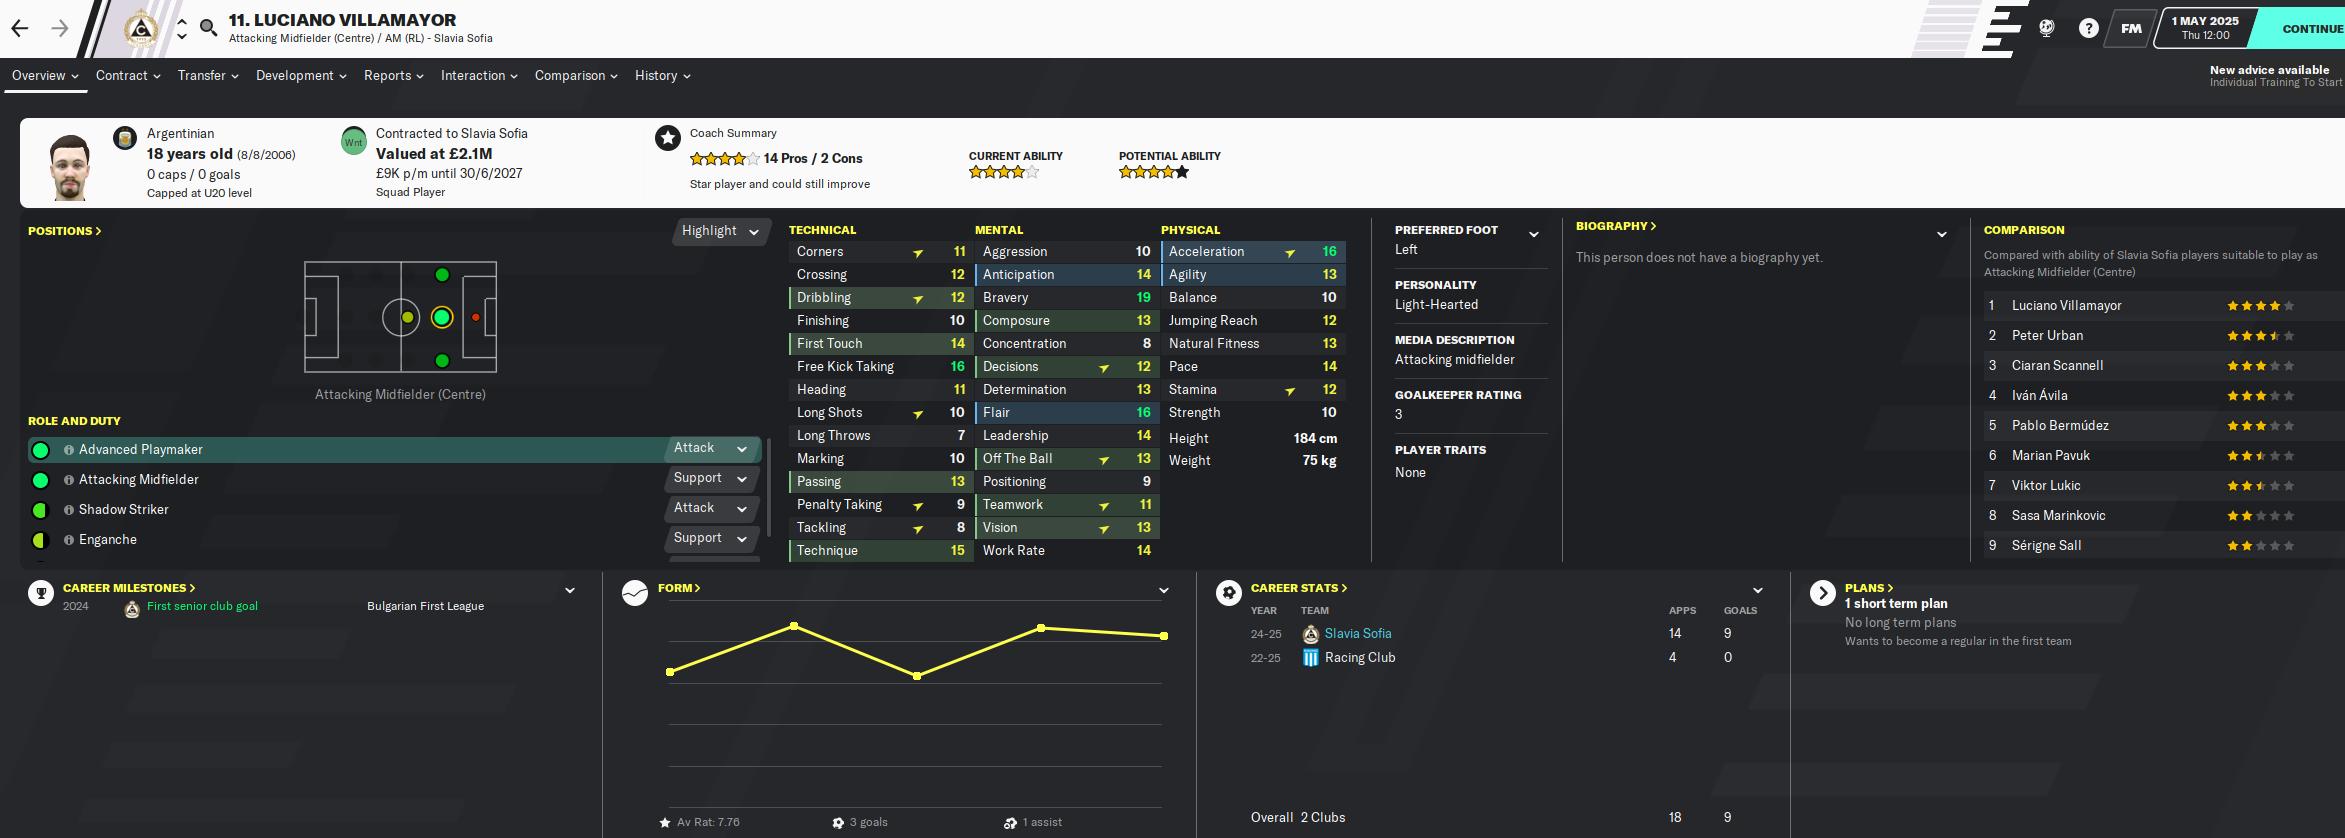 Best player Villamayor.png